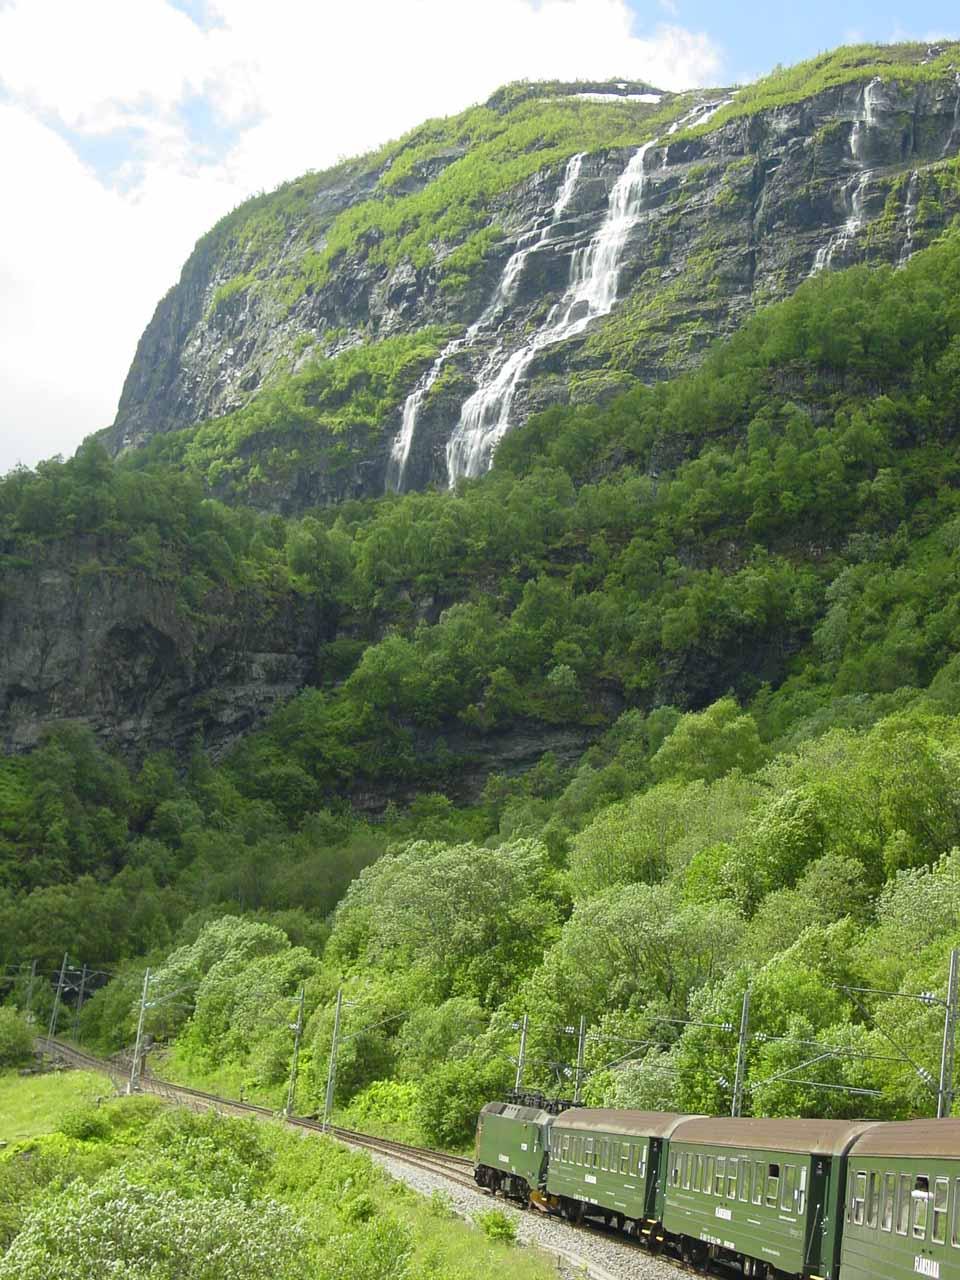 Waterfalls galore along Flåmbana (The Flam Railway)